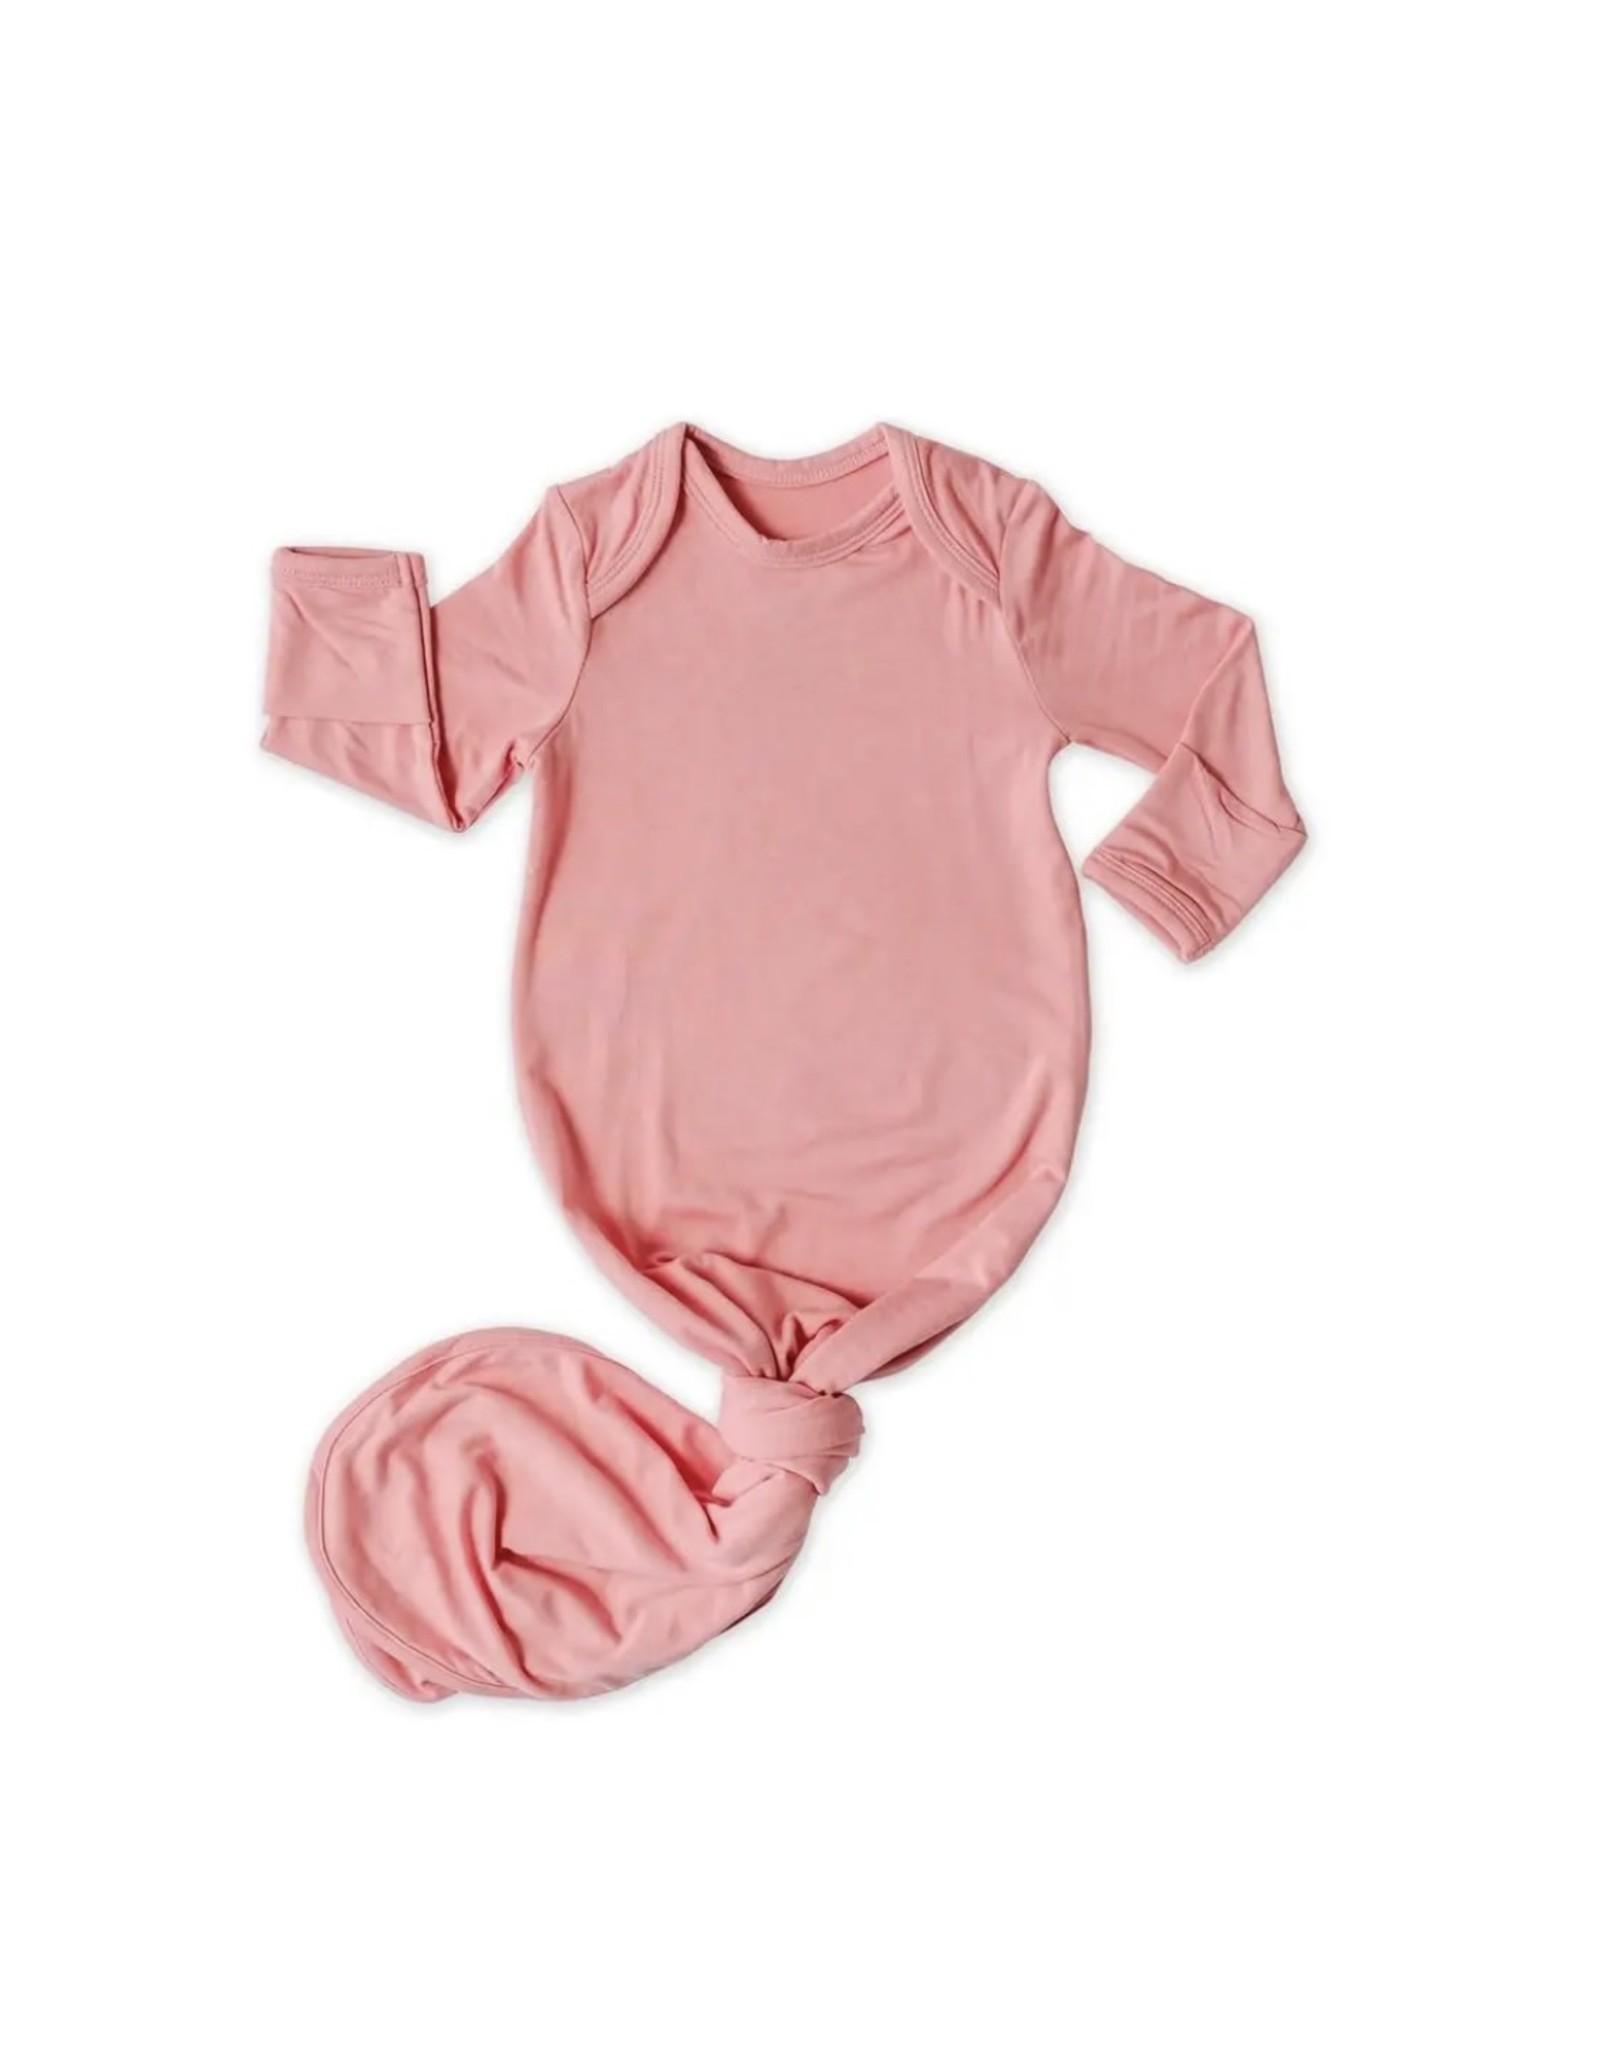 Little Sleepies Little Sleepies- Bubblegum Bamboo Viscose Knotted Gown